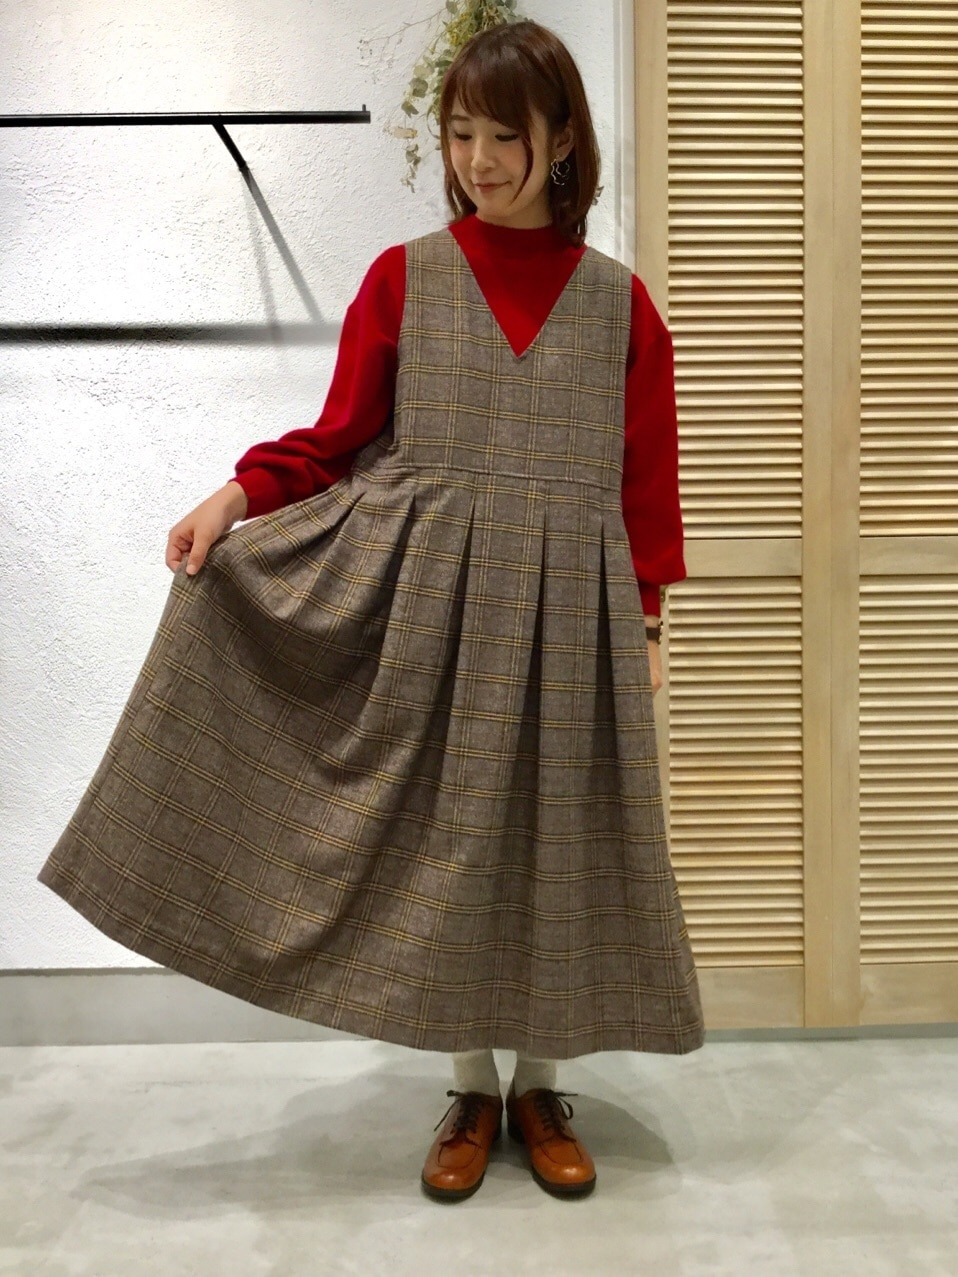 chambre de charme iki 横浜ジョイナス 身長:162cm 2019.11.16